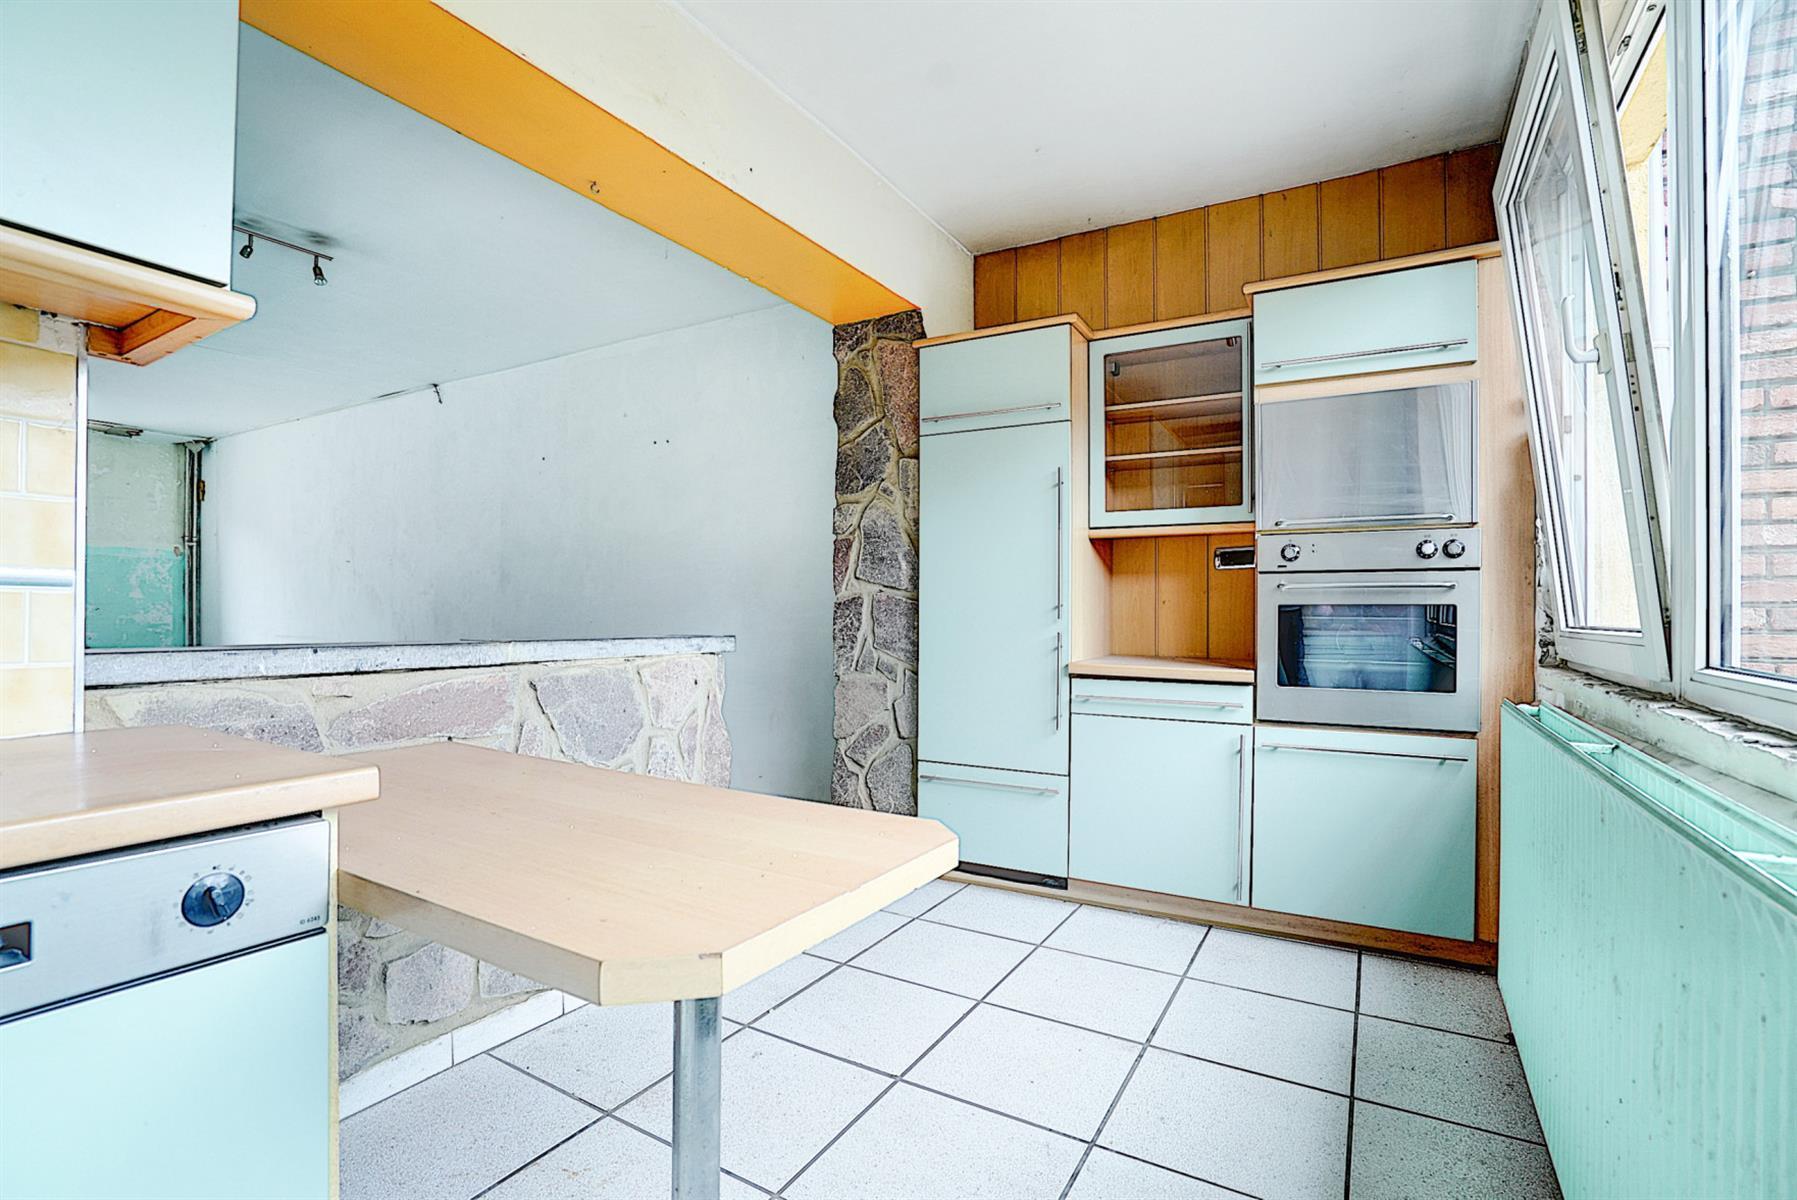 Maison - Saint-nicolas - #4357054-6